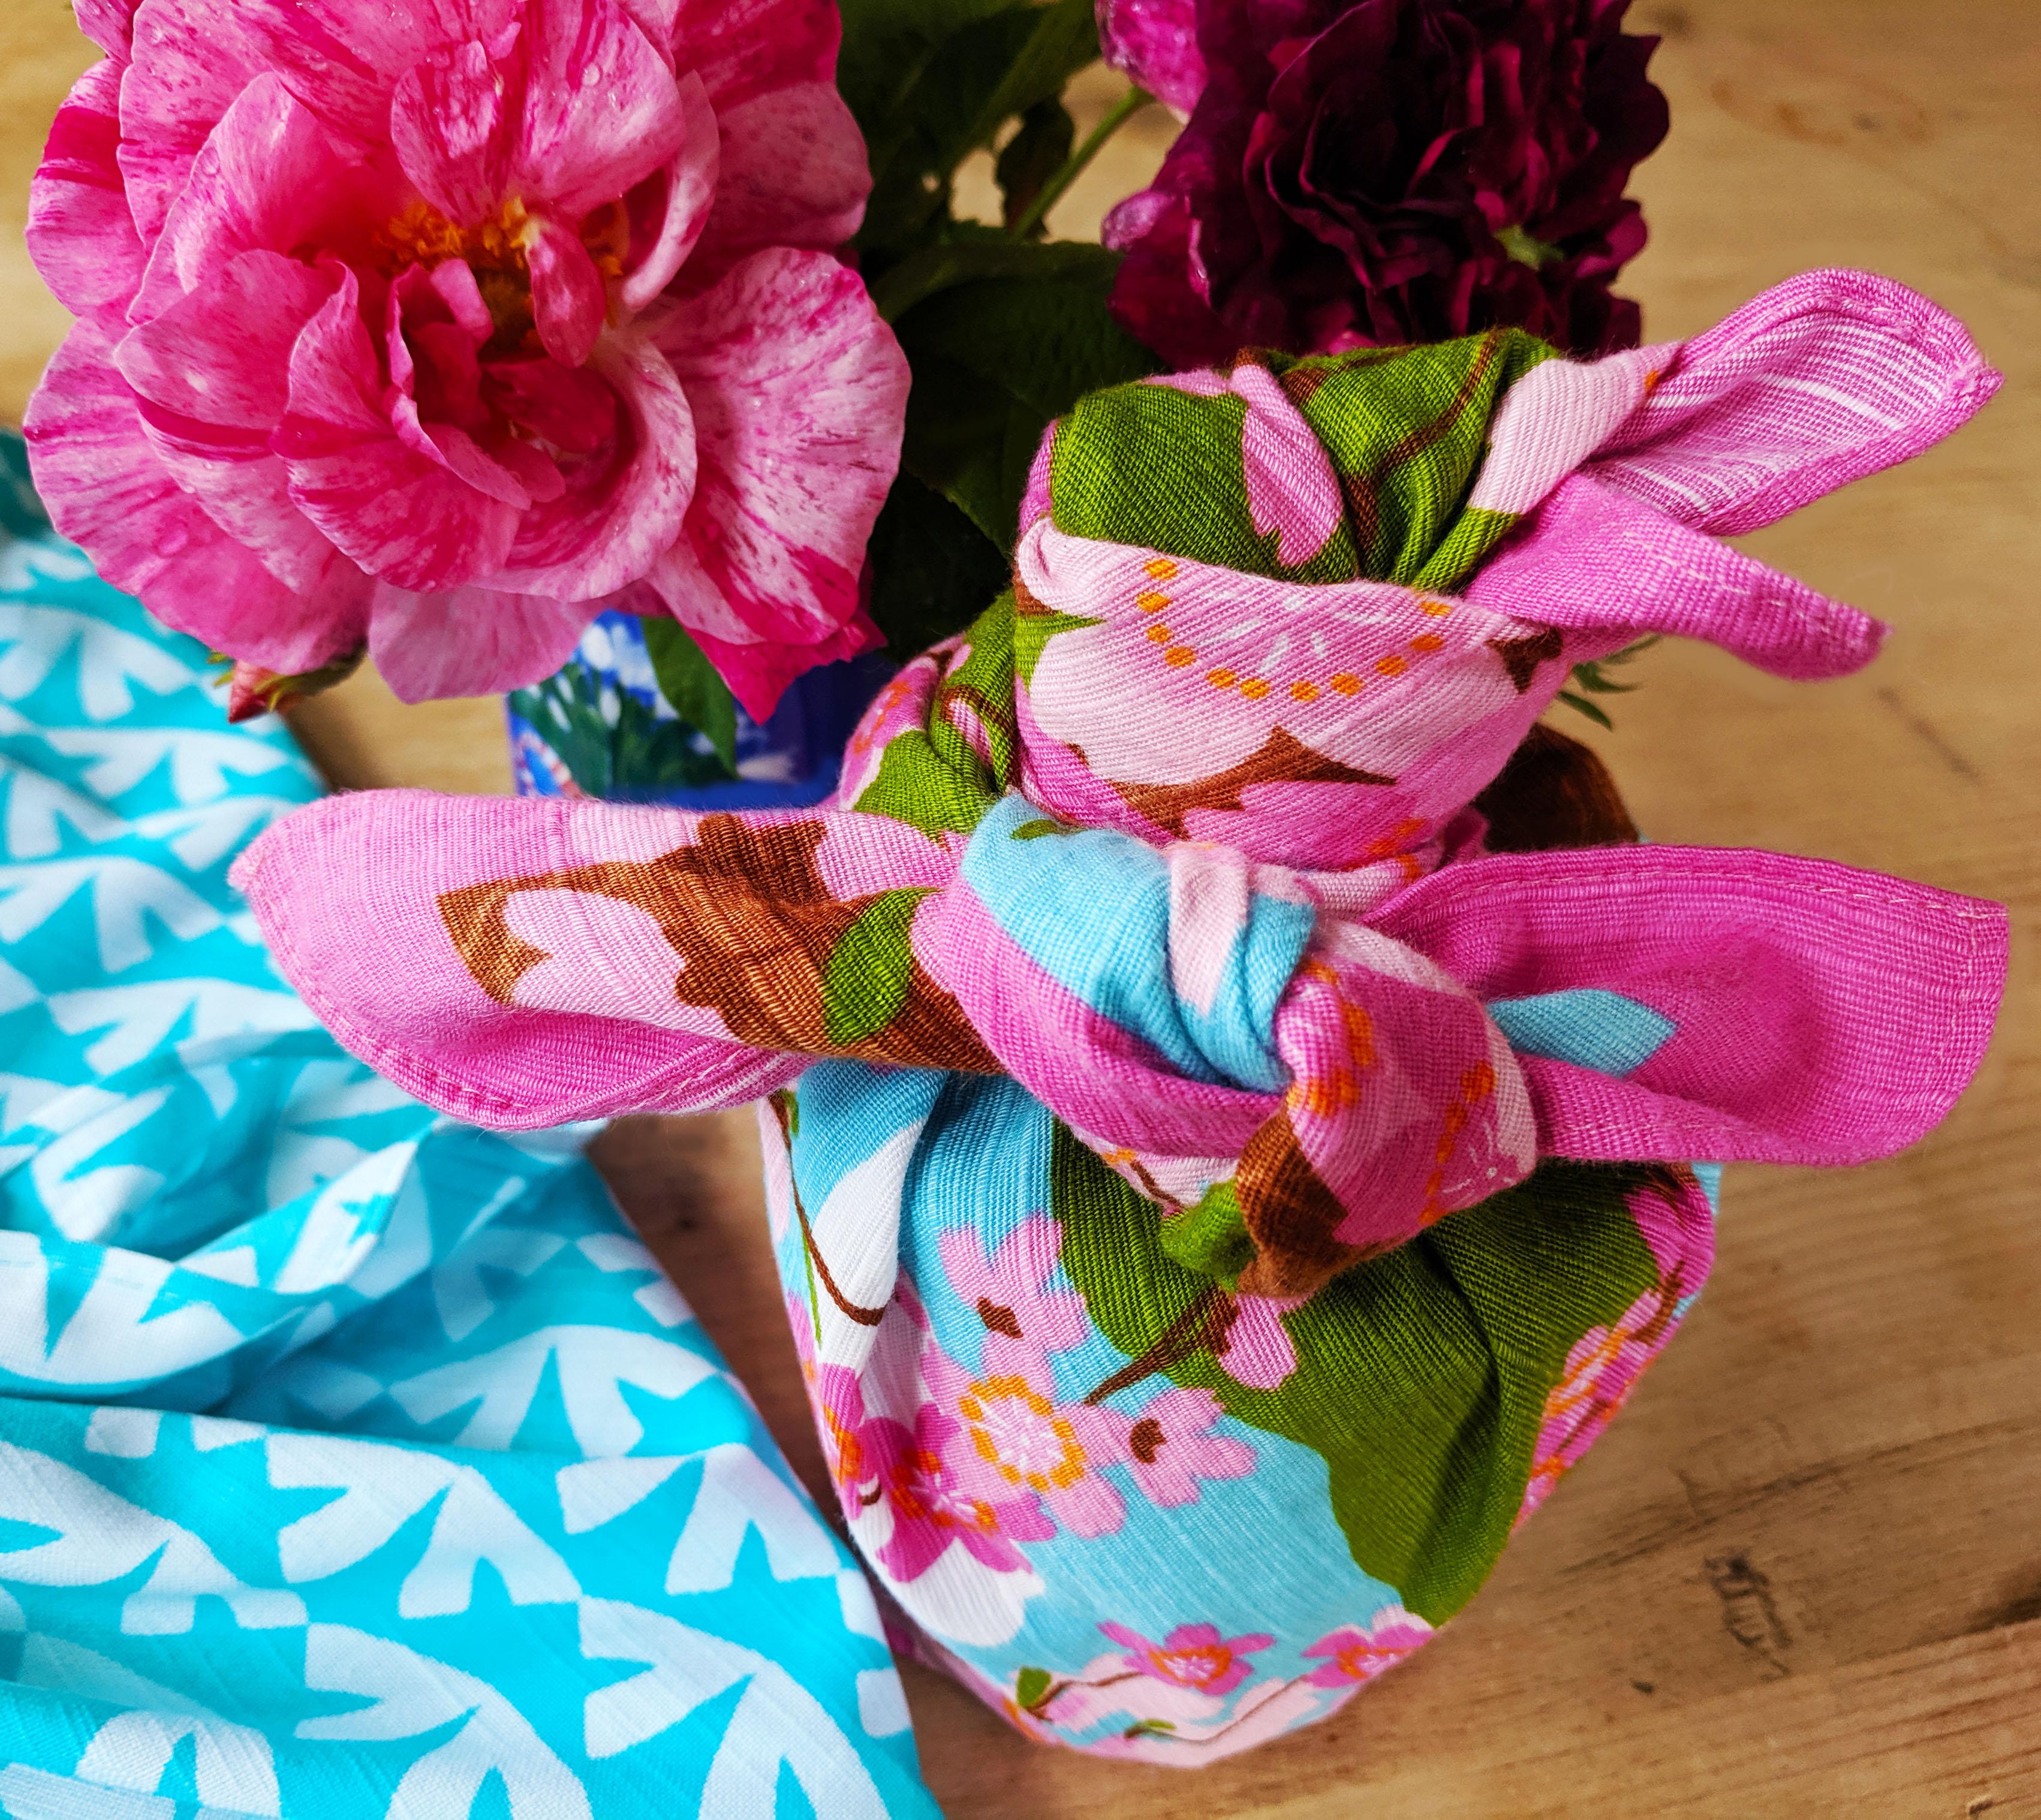 Japanese furoshiki fabric giftwrap